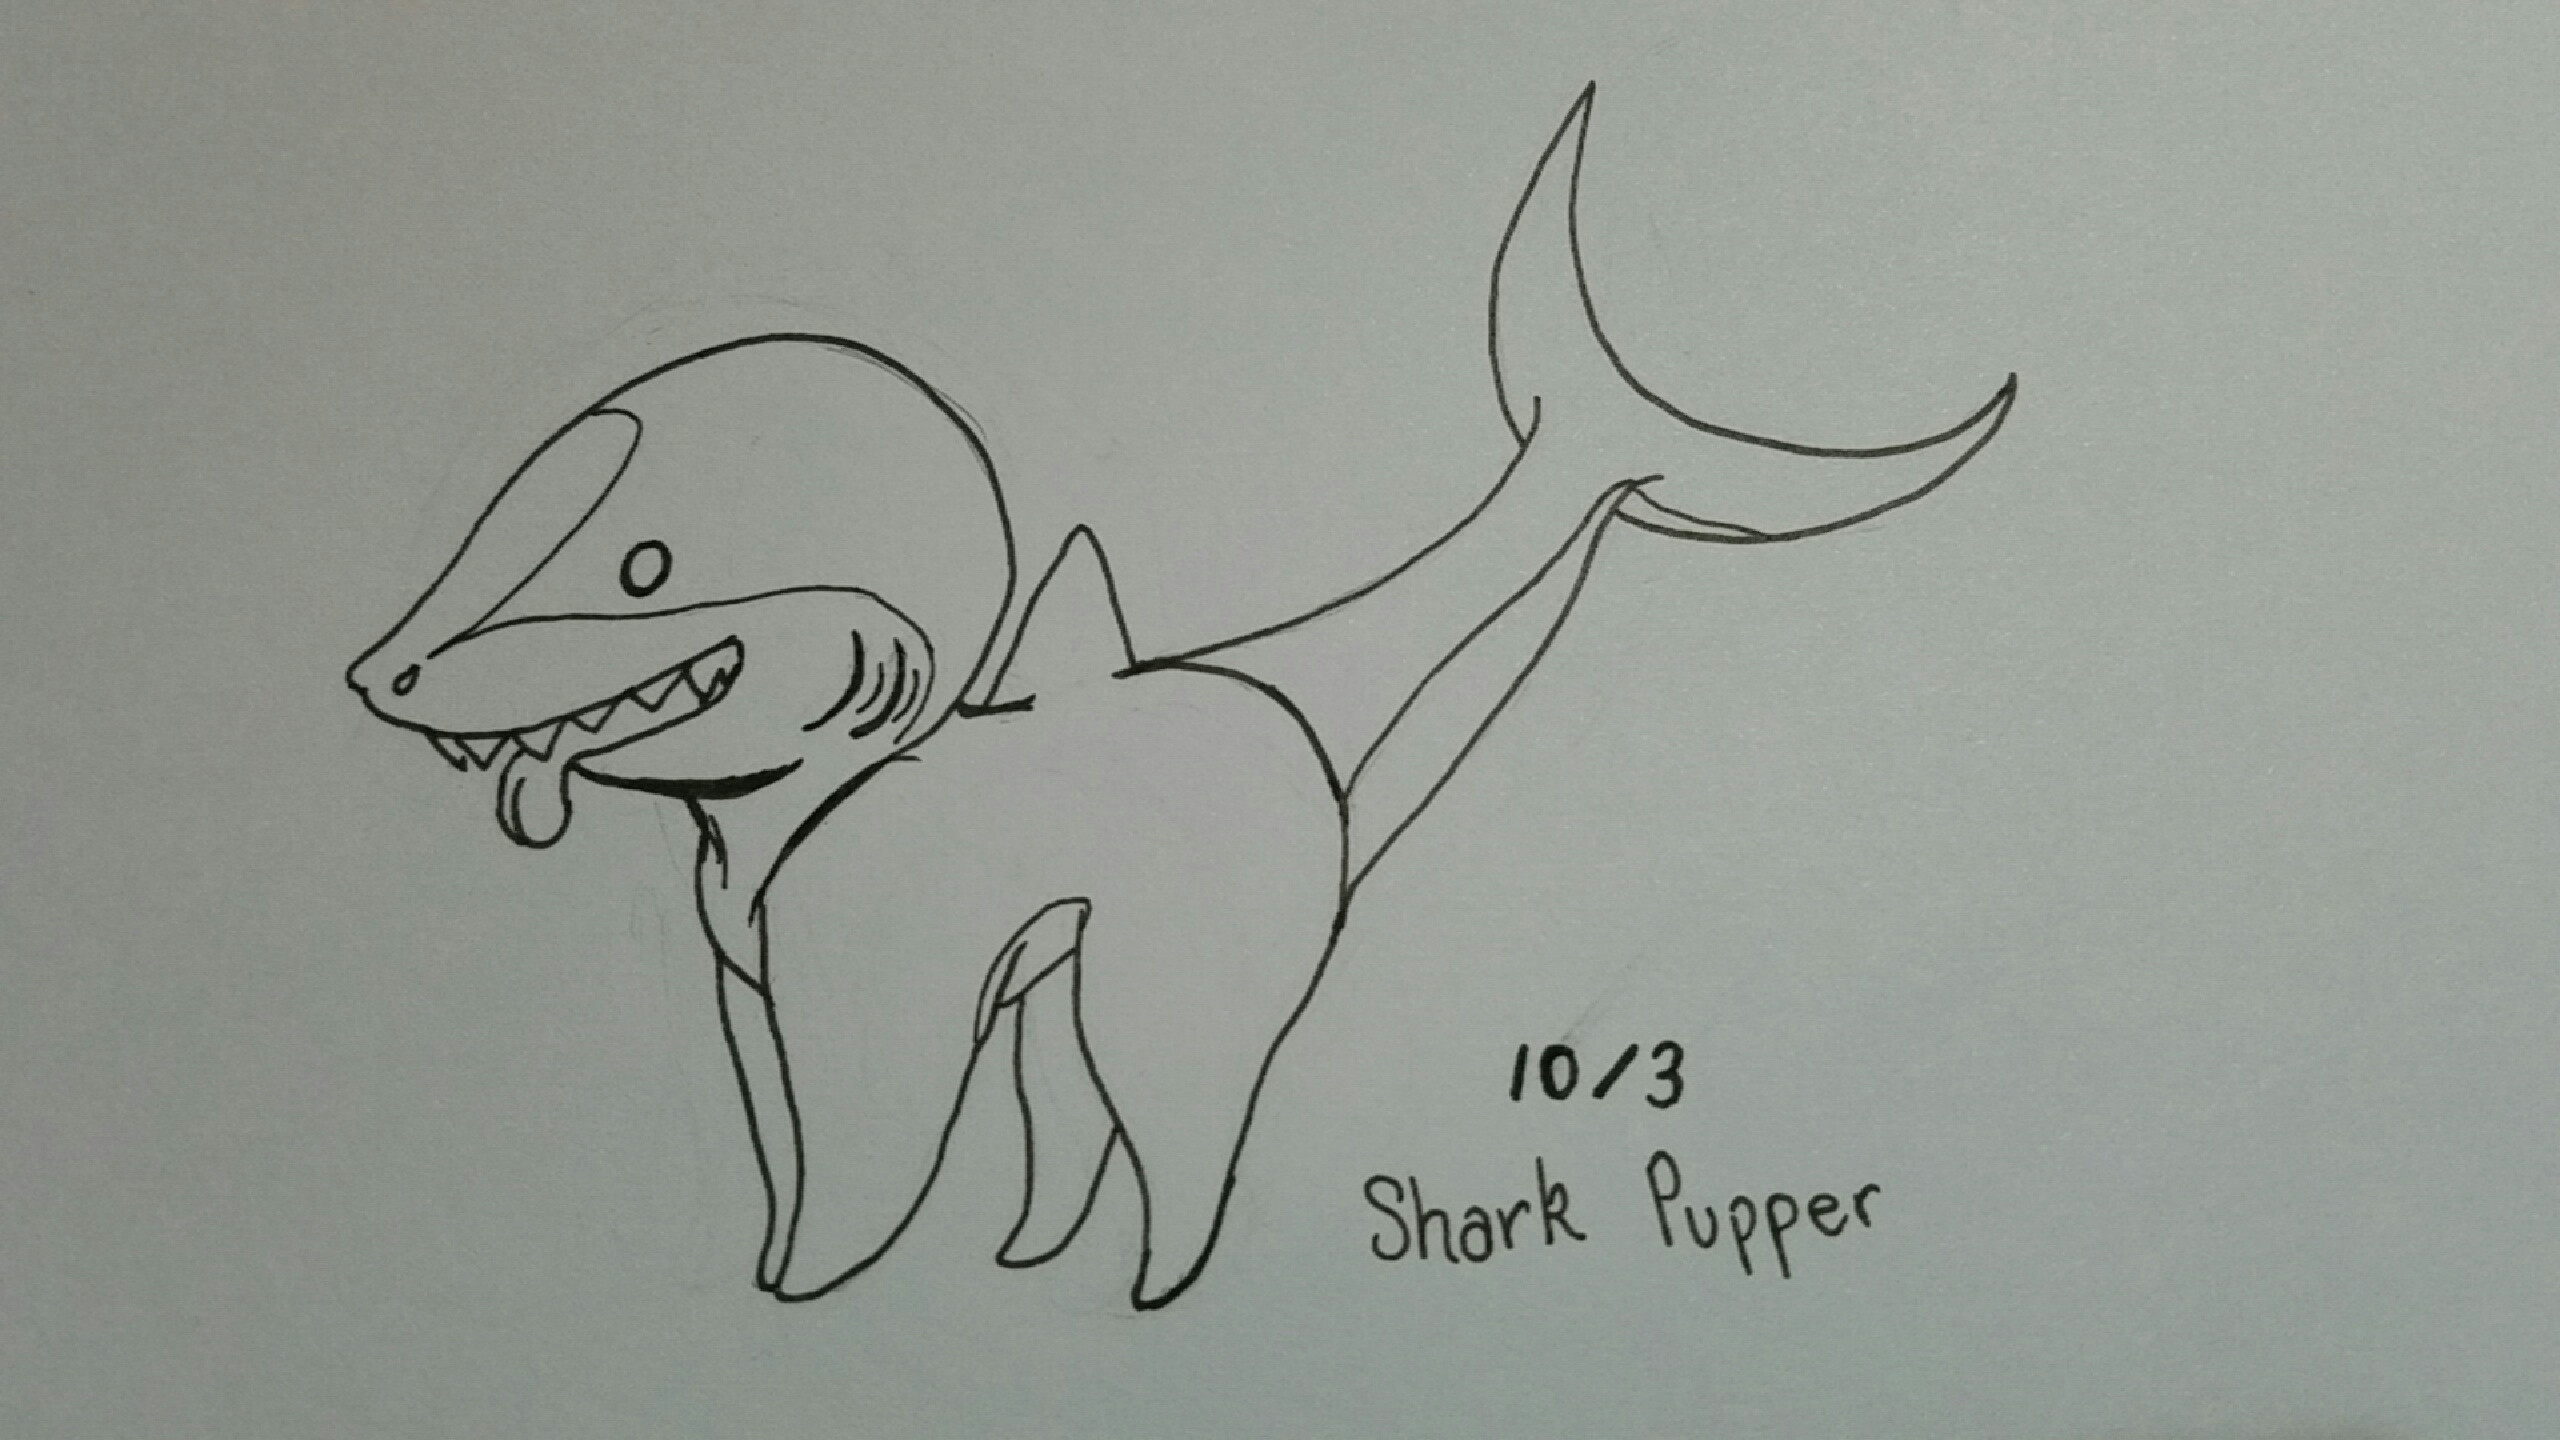 Drawn shark 3rd Like But doing : pupper